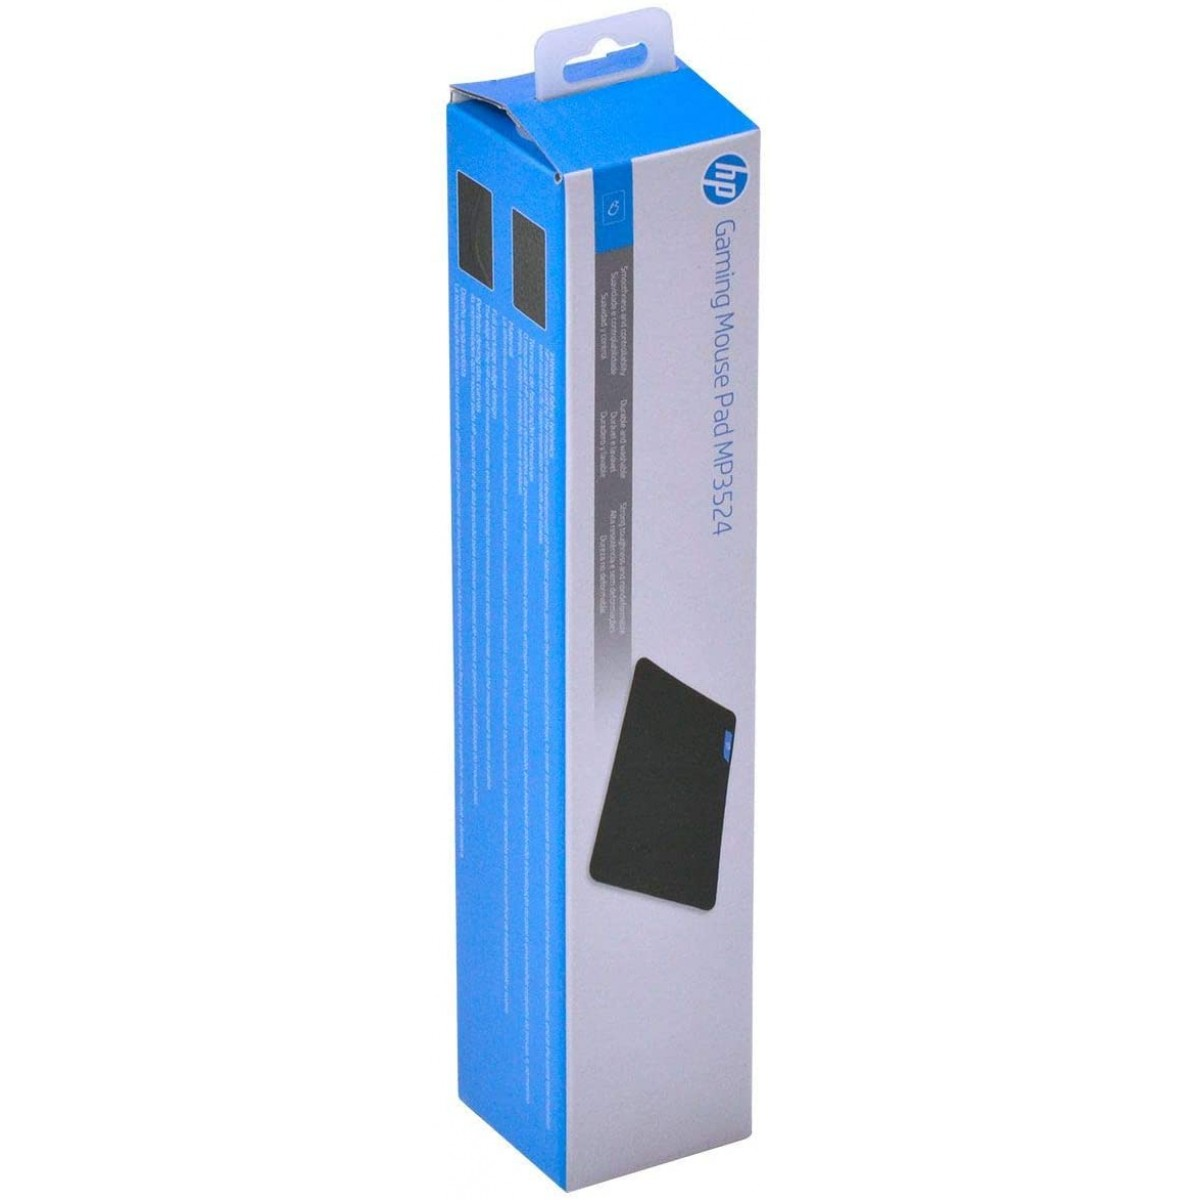 Mousepad Gamer HP MP3524, Pequeno, Prova D'agua, Black, 30628